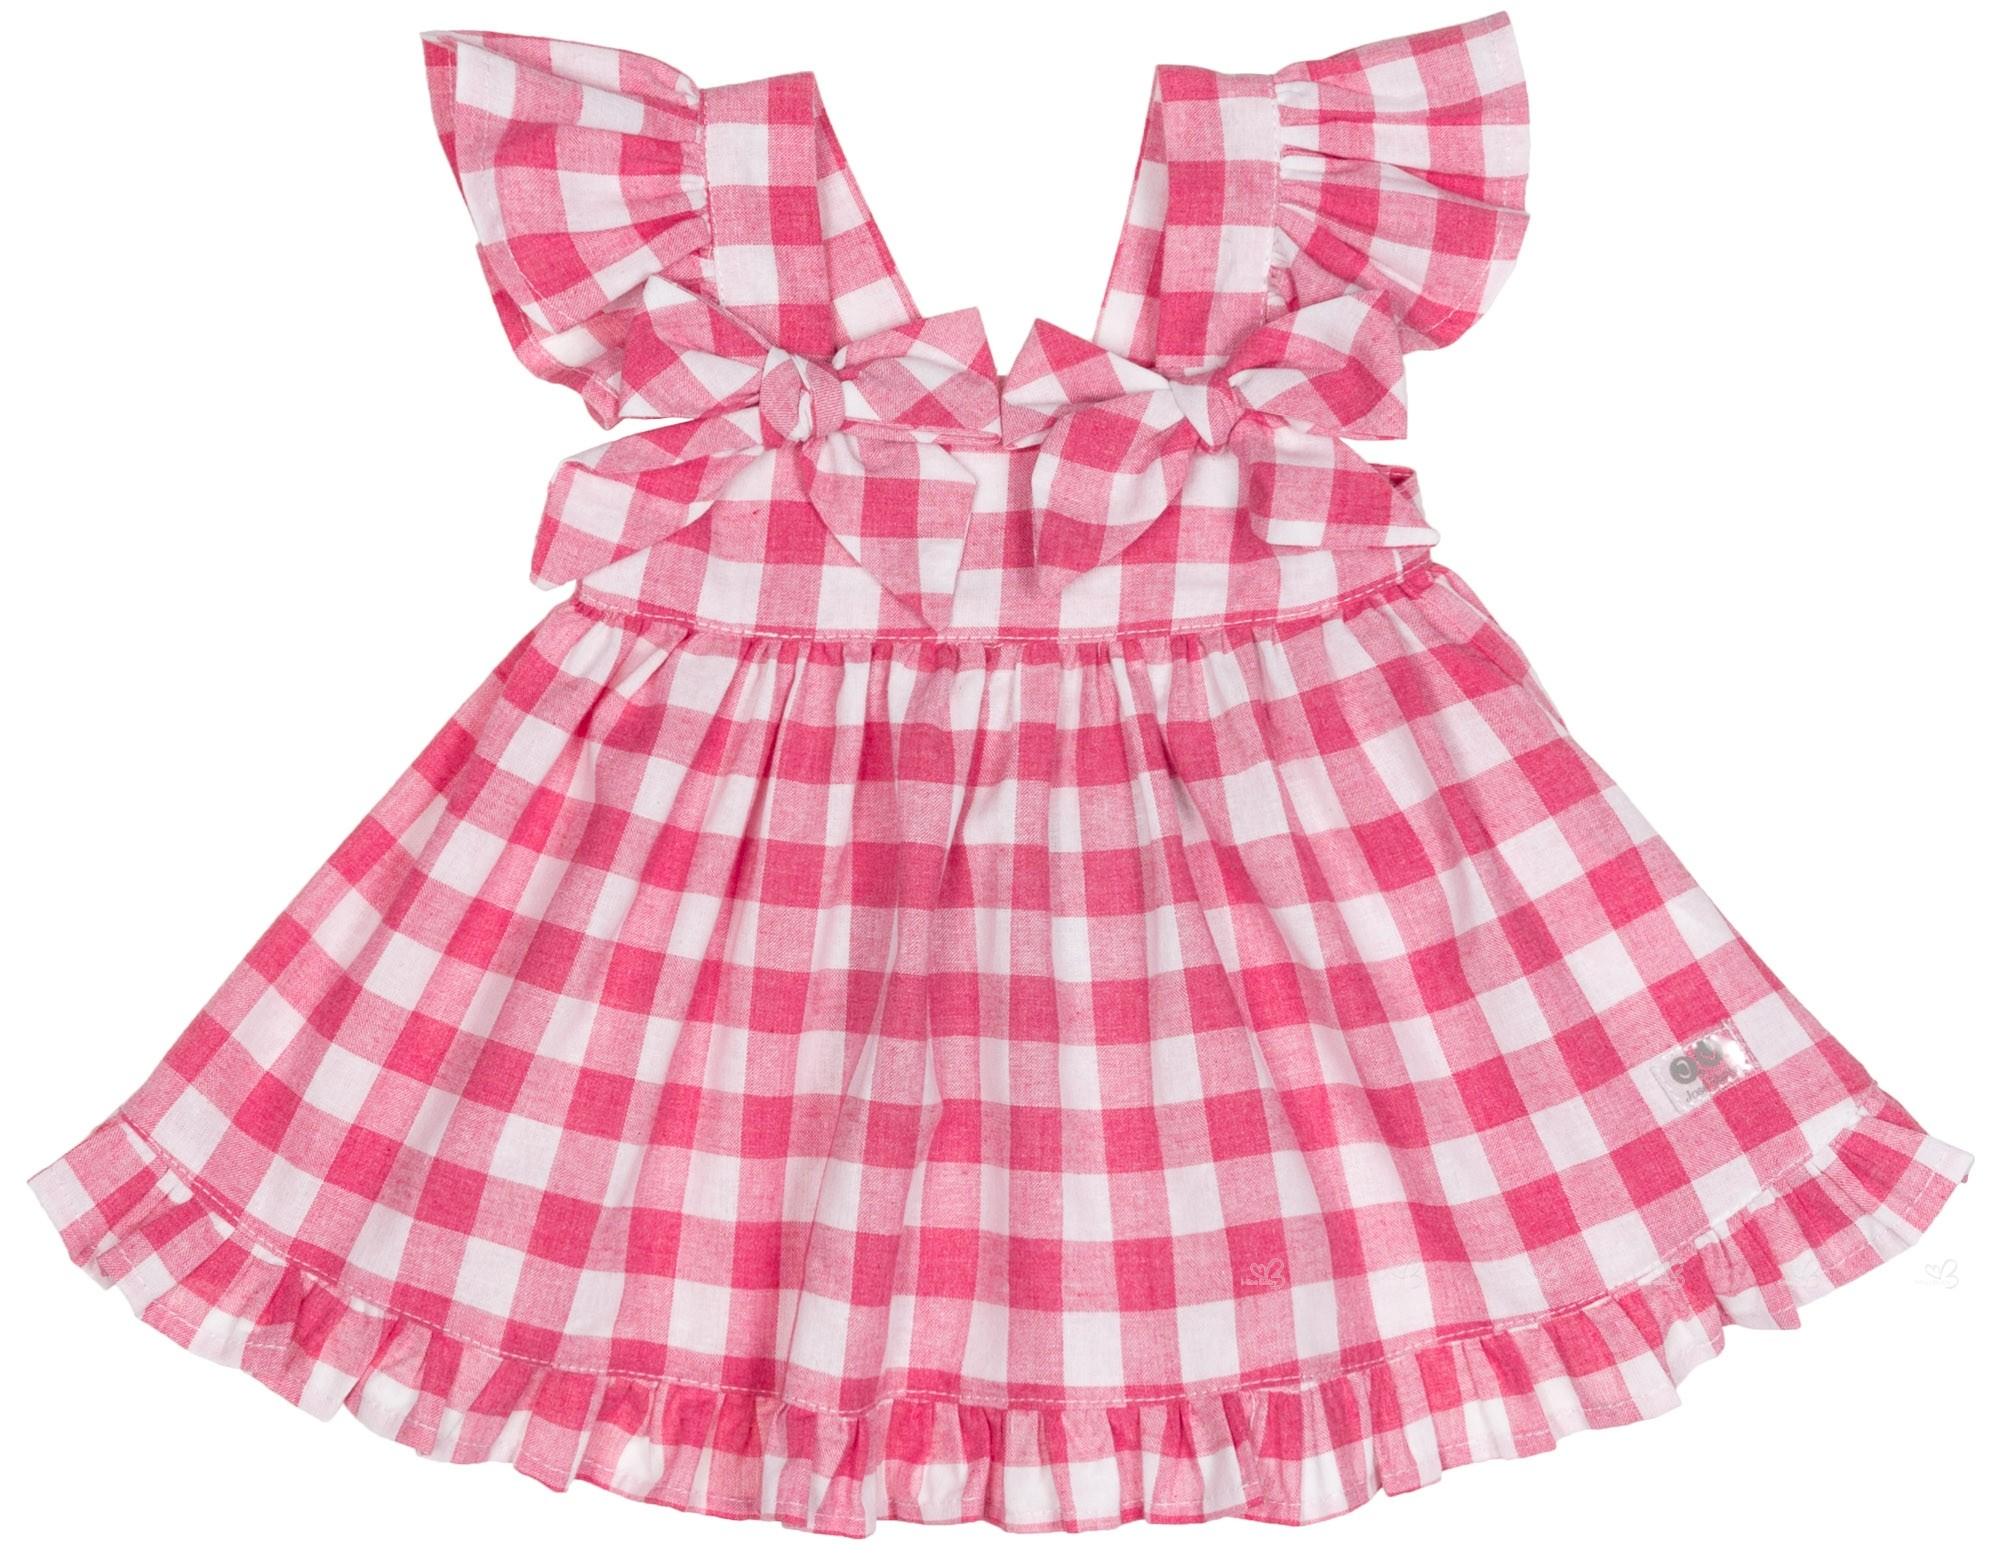 fa1bdc4a700 Home  Girls Red   White Gingham Dress. José Varón Vestido Niña Volante  Cuadros Vichy Rojo Blanco ...